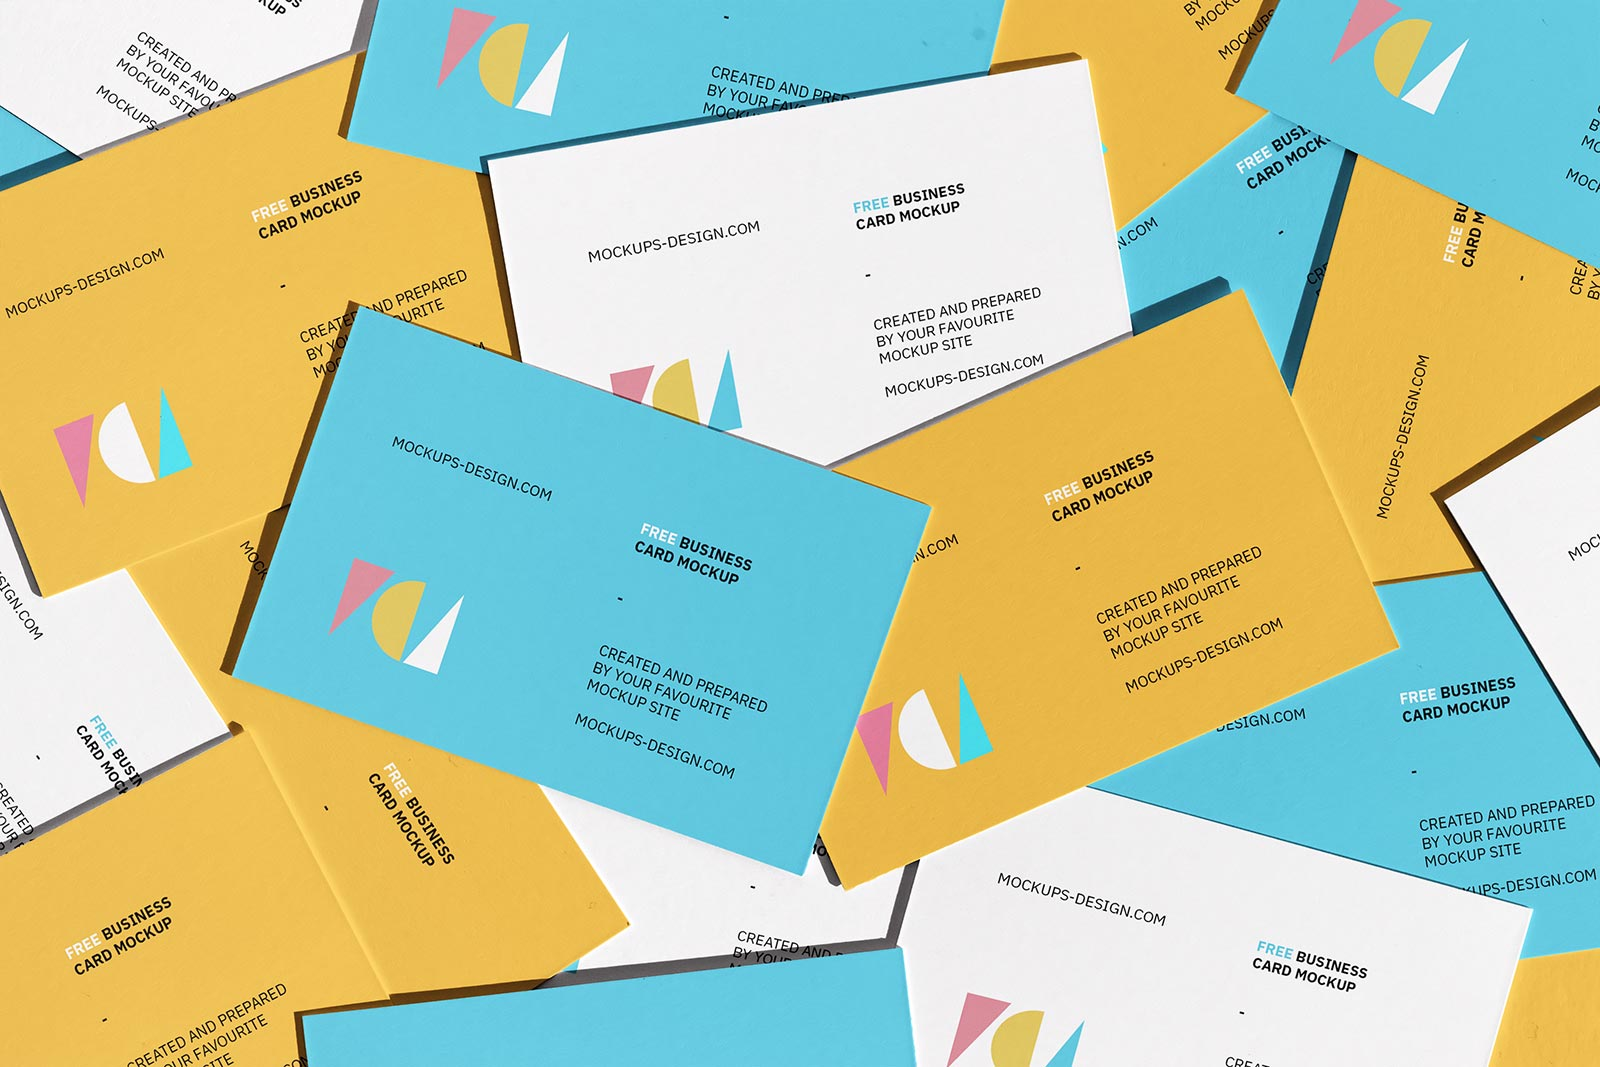 85 x 55_Business_Card_Mockup